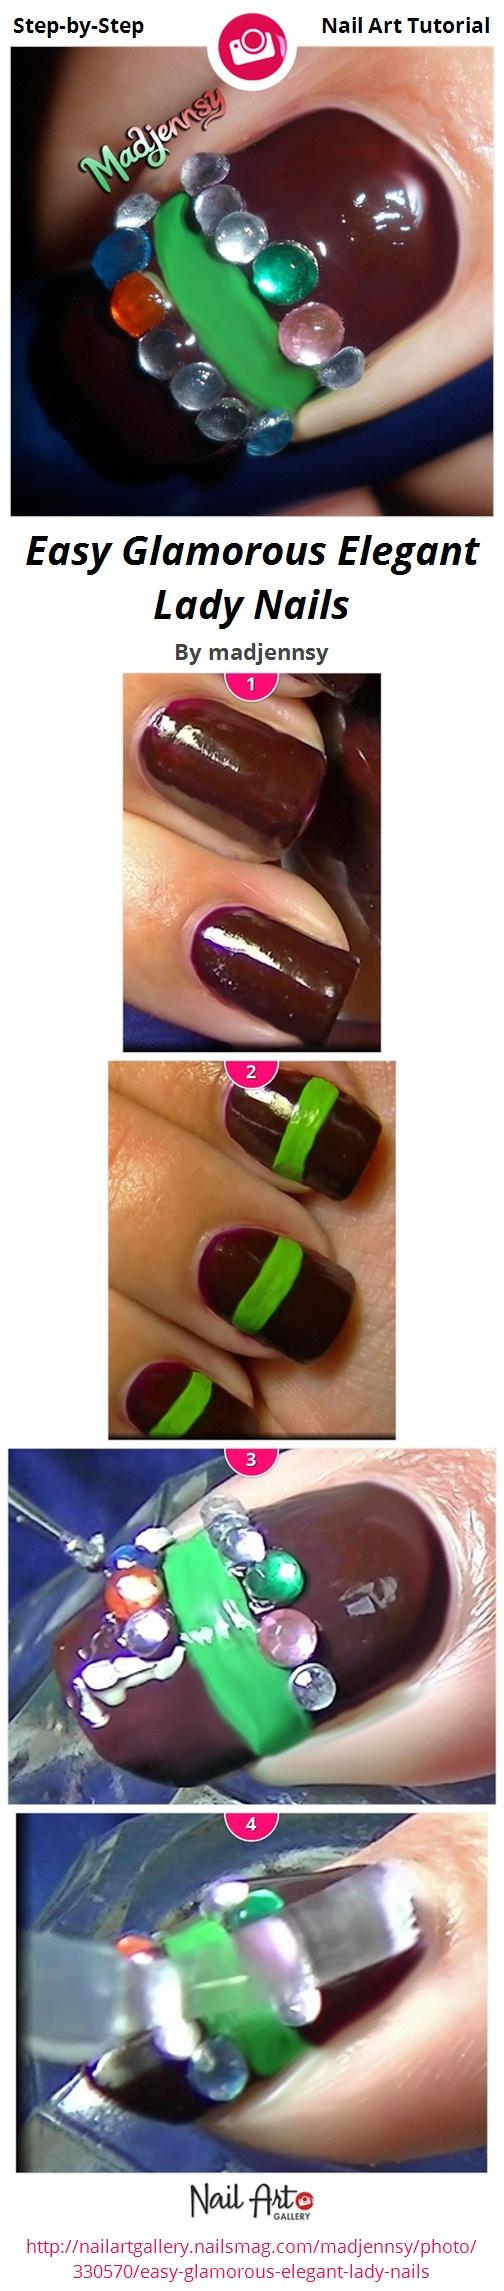 Easy Glamorous Elegant Lady Nails - Nail Art Gallery